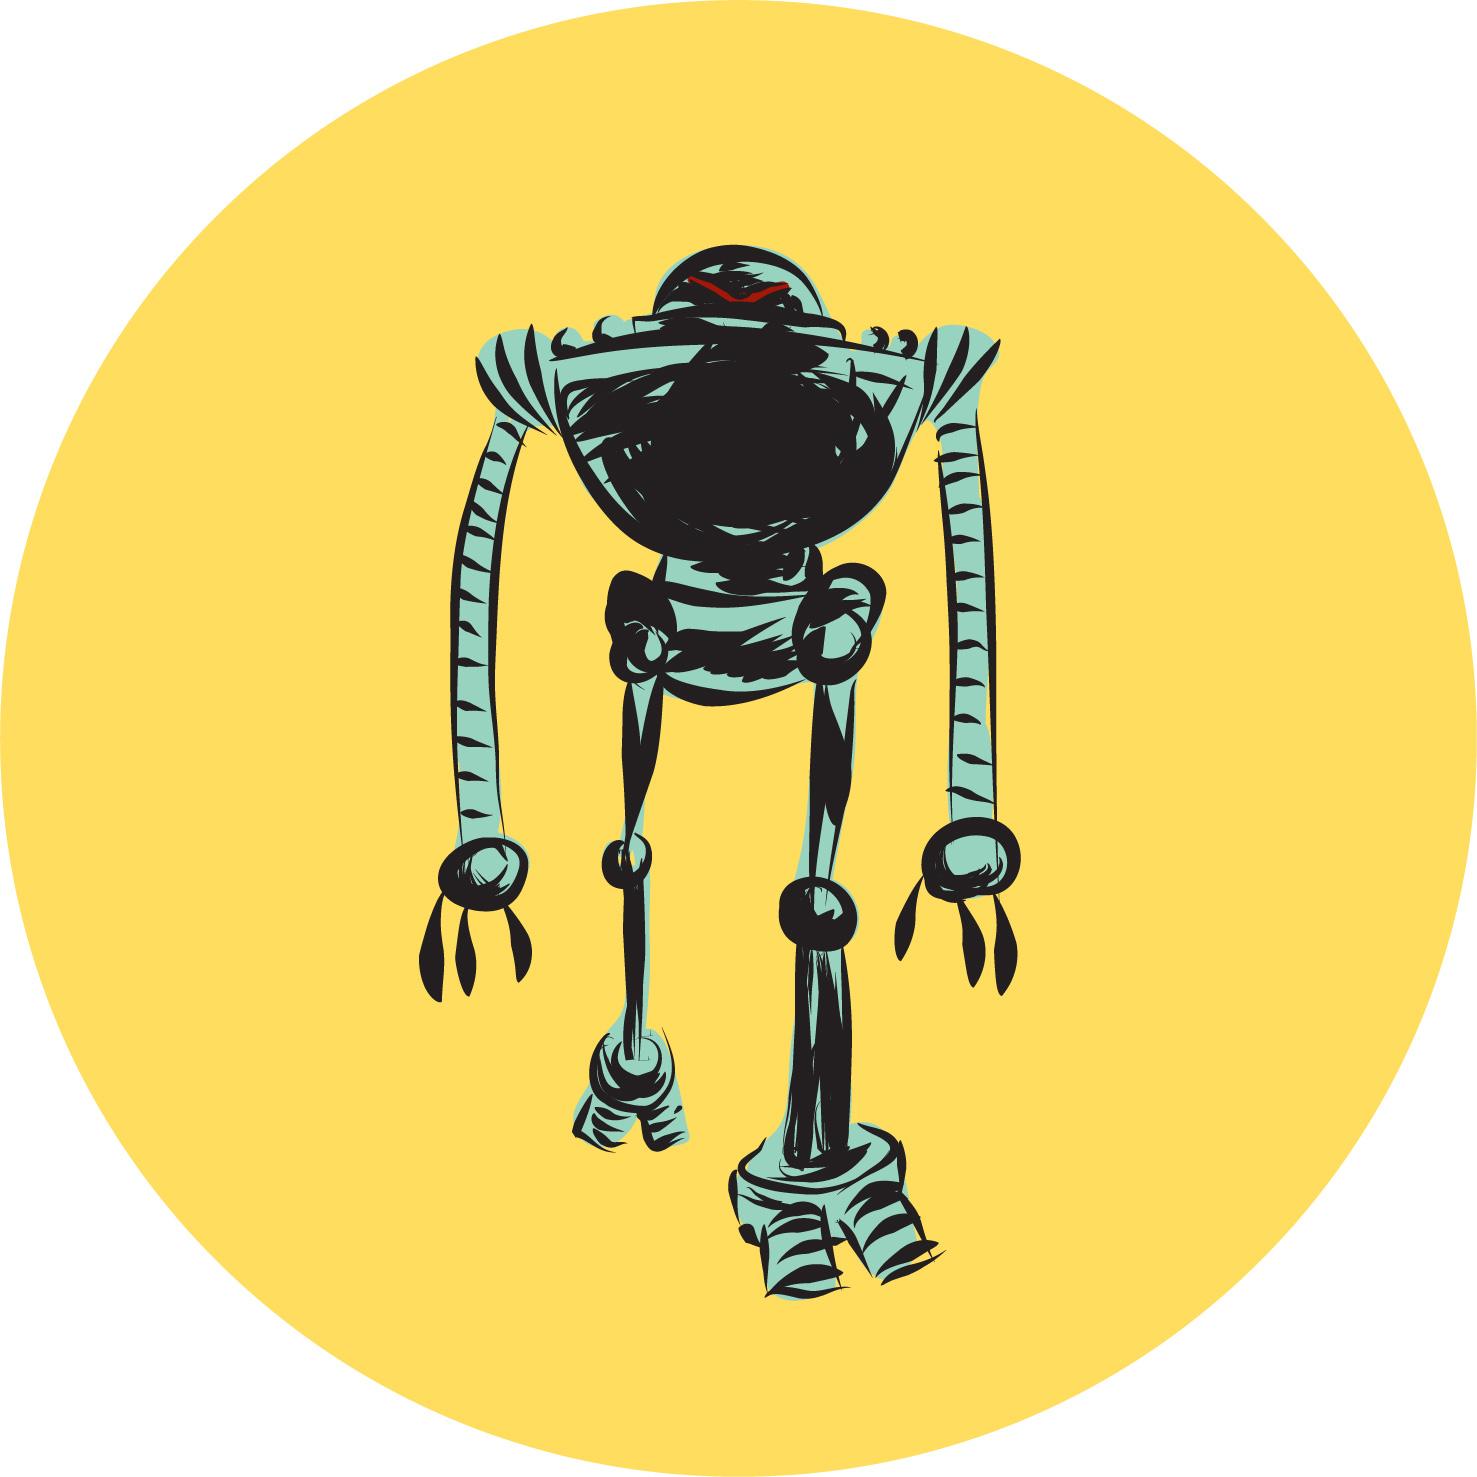 Marchin_Robot